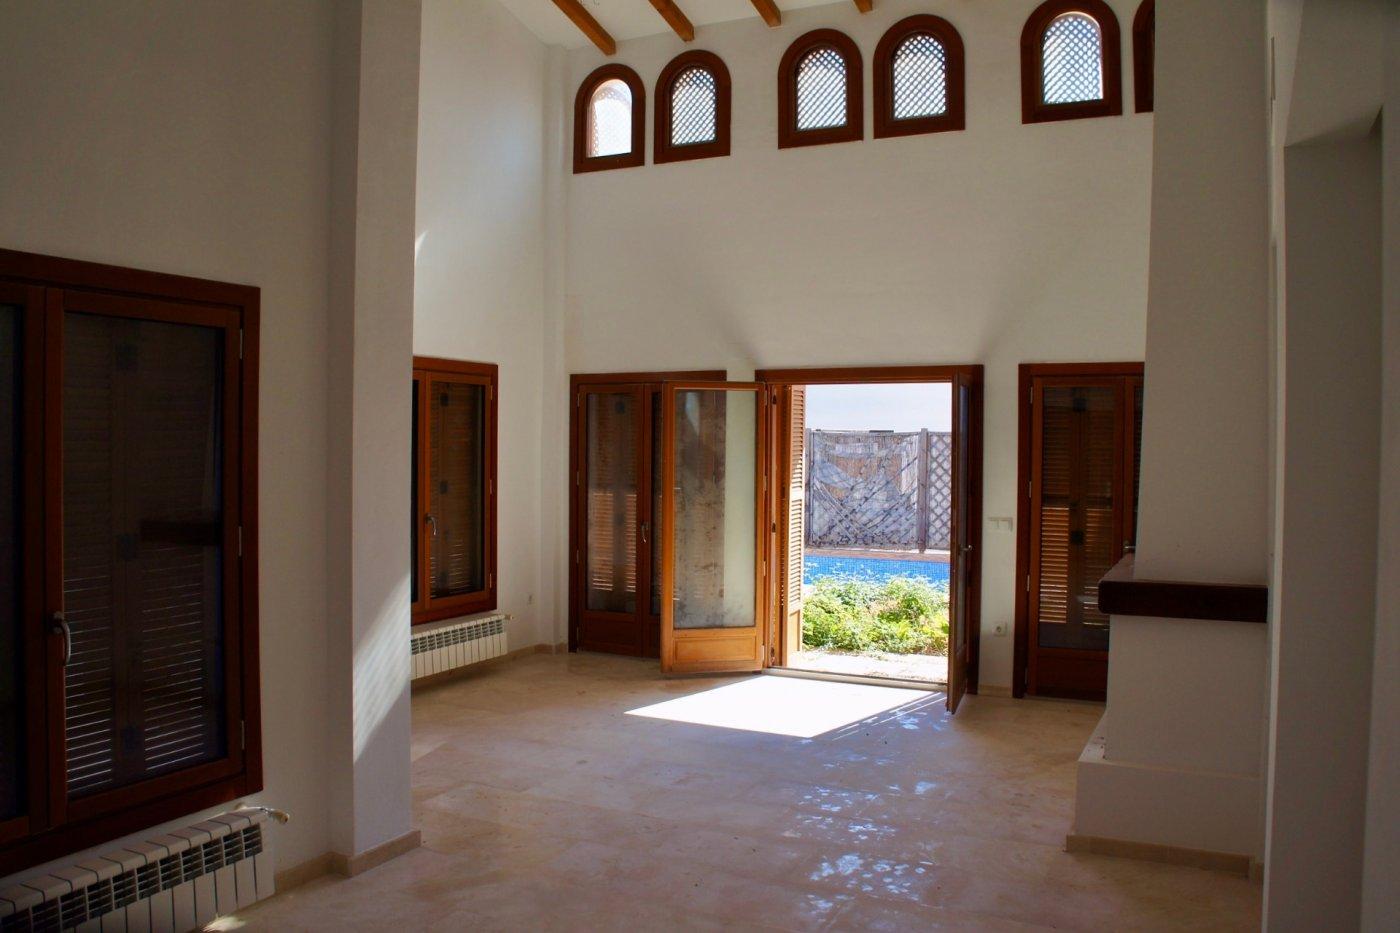 Gallery Image 8 of Fantastic offer - bank repossessed south facing villa on EL Valle Golf Resort